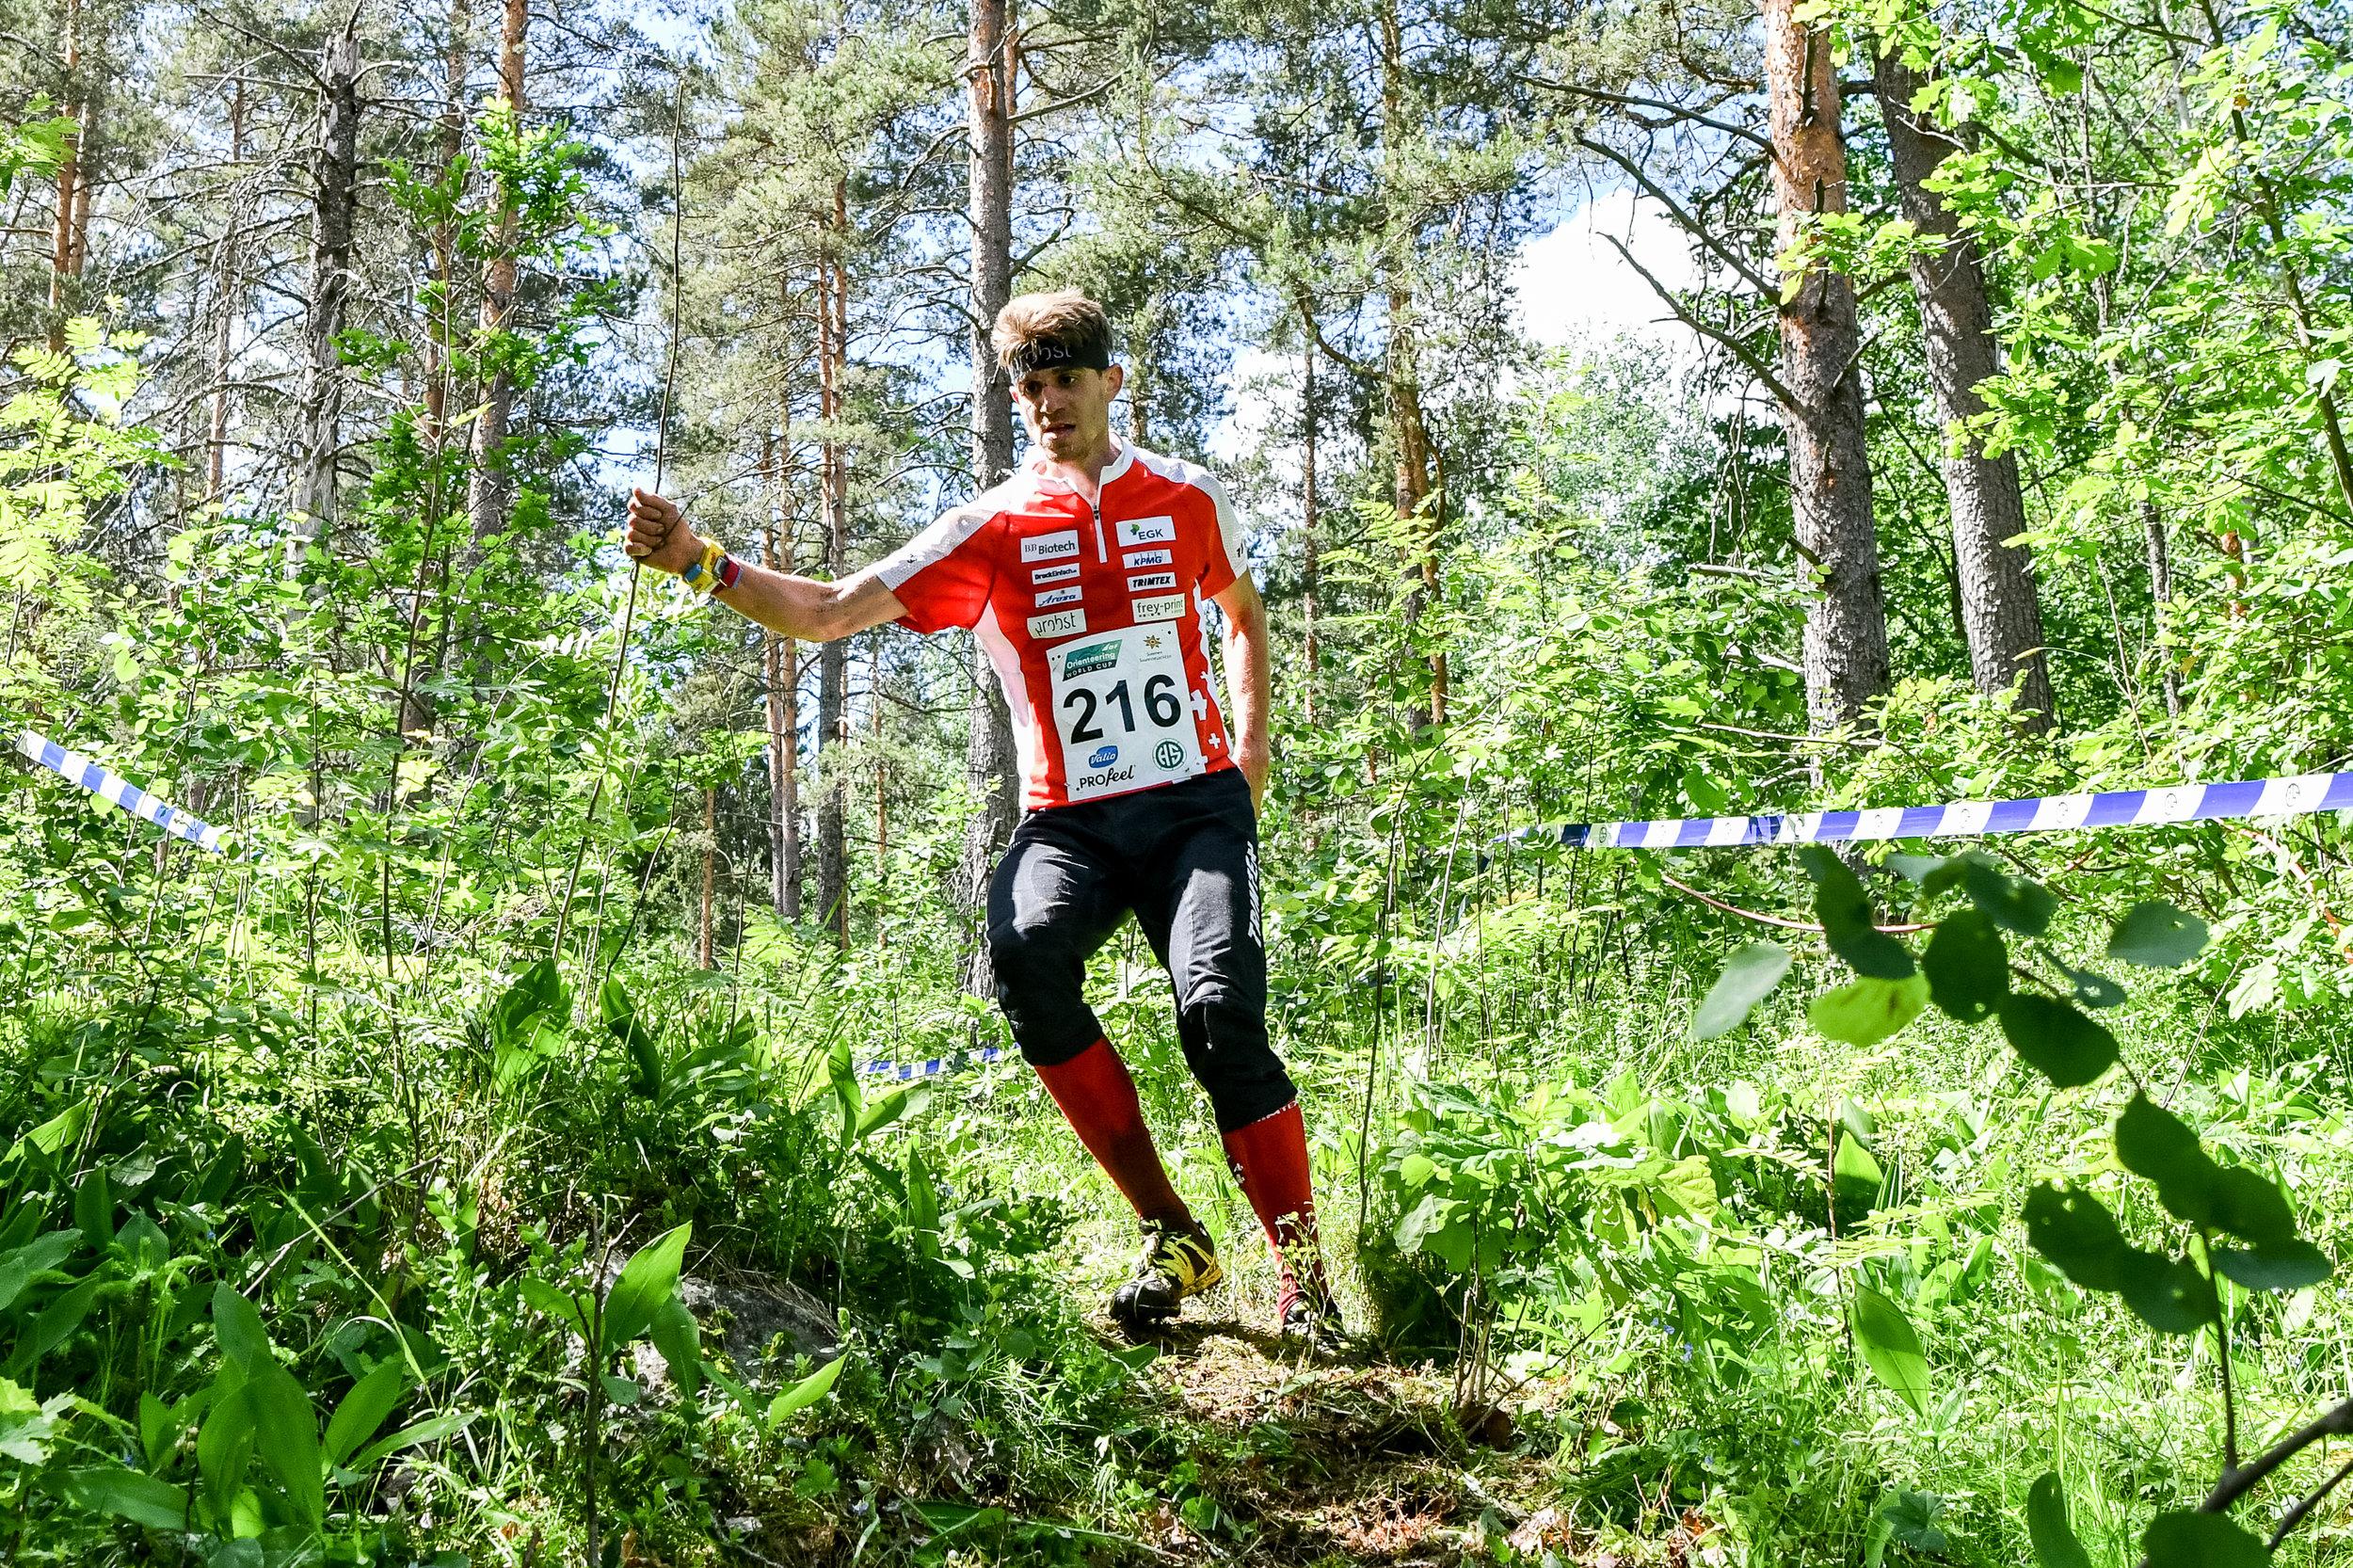 Photo by: Markku Brummer